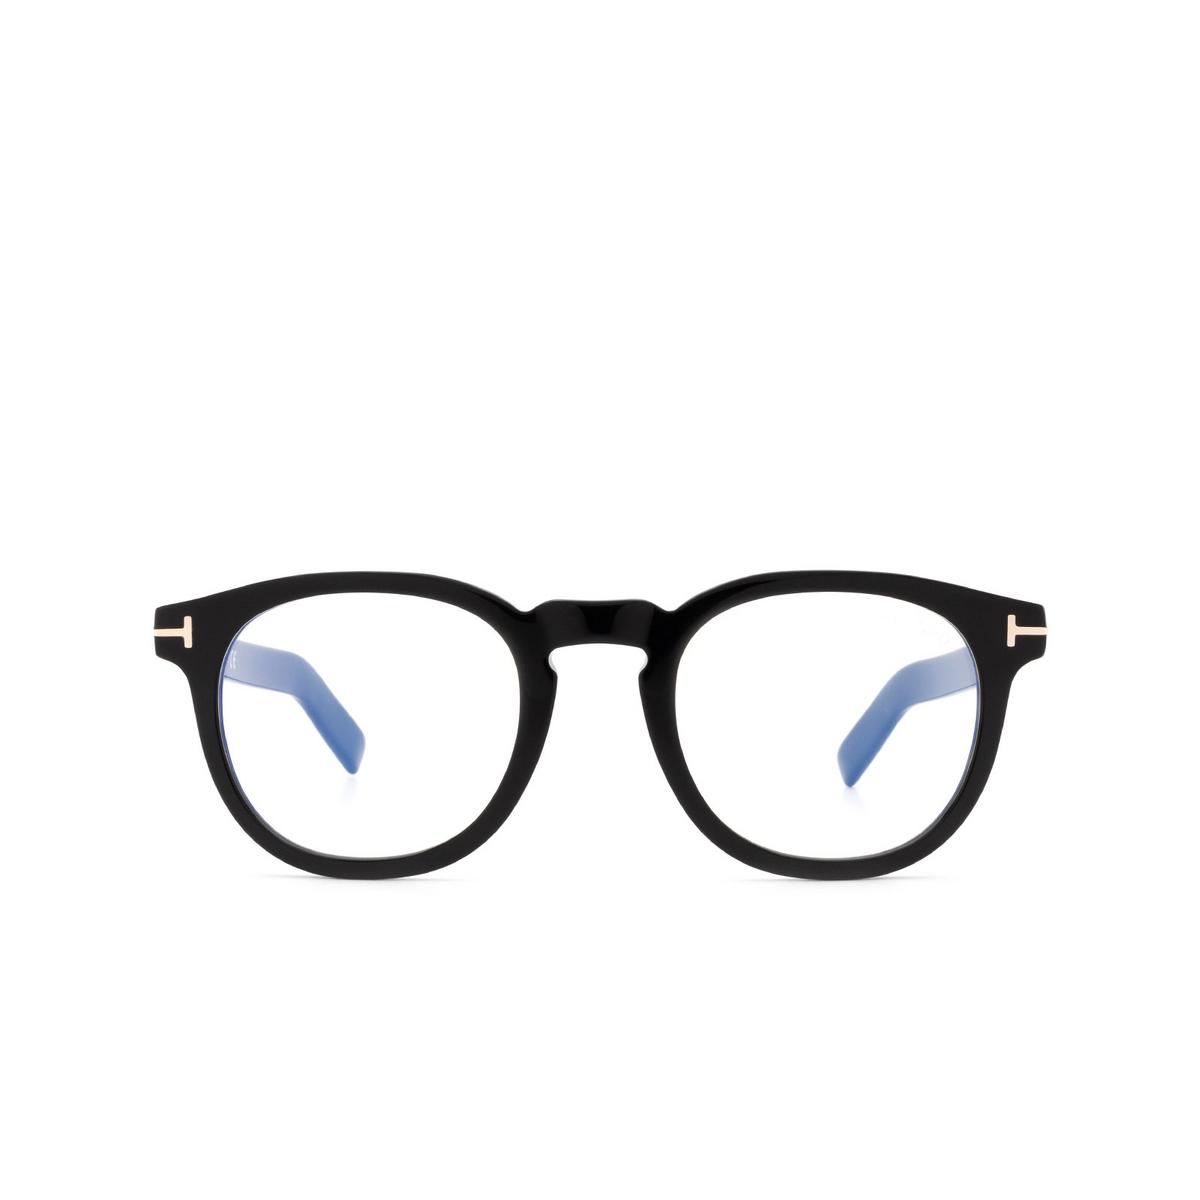 Tom Ford® Square Eyeglasses: FT5629-B color Shiny Black 001 - front view.